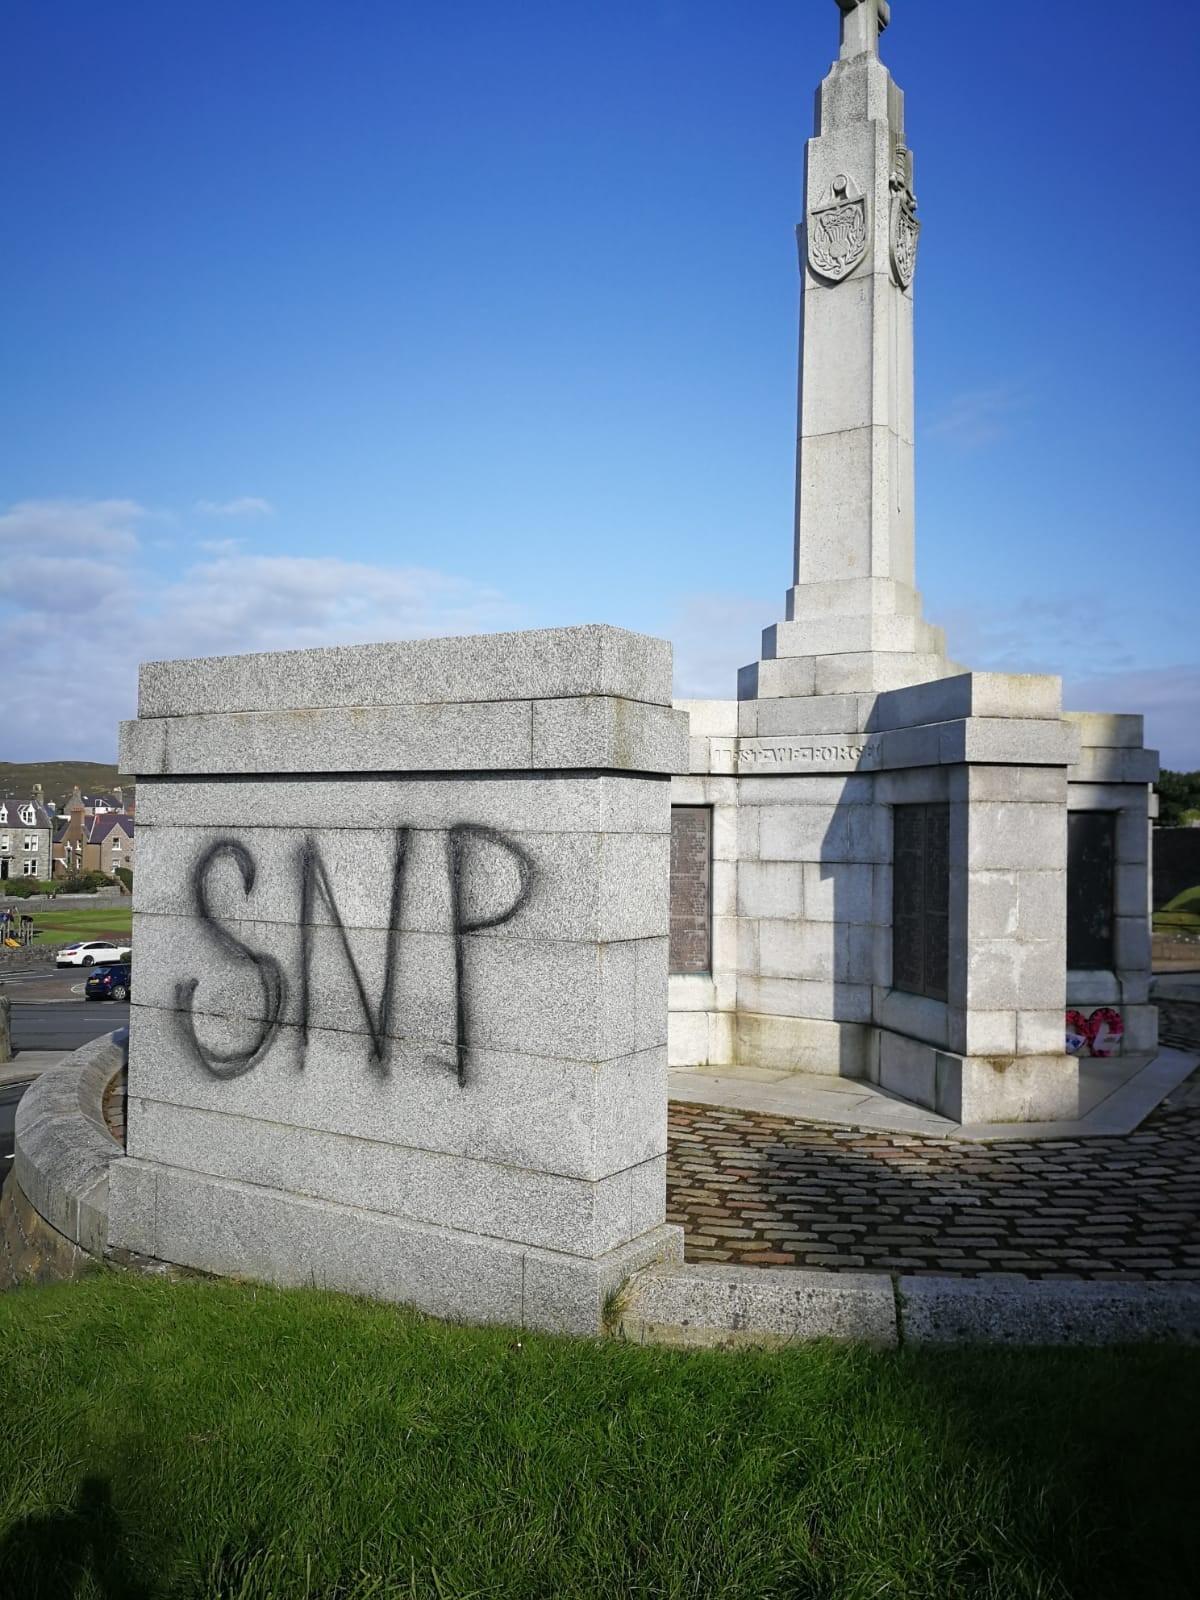 Shetland byelection turns ugly as SNP graffiti sprayed on war memorial